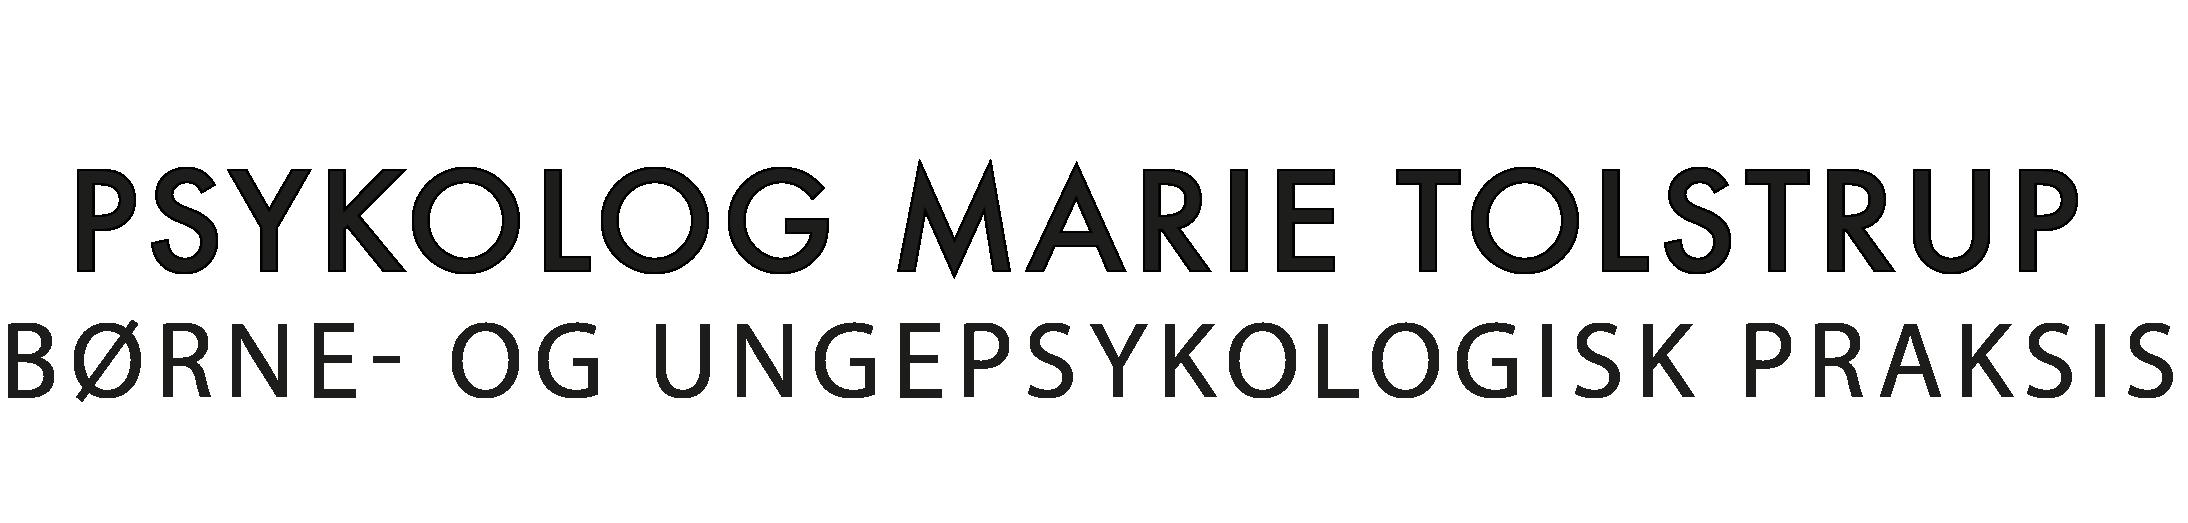 Psykolog Marie Tolstrup